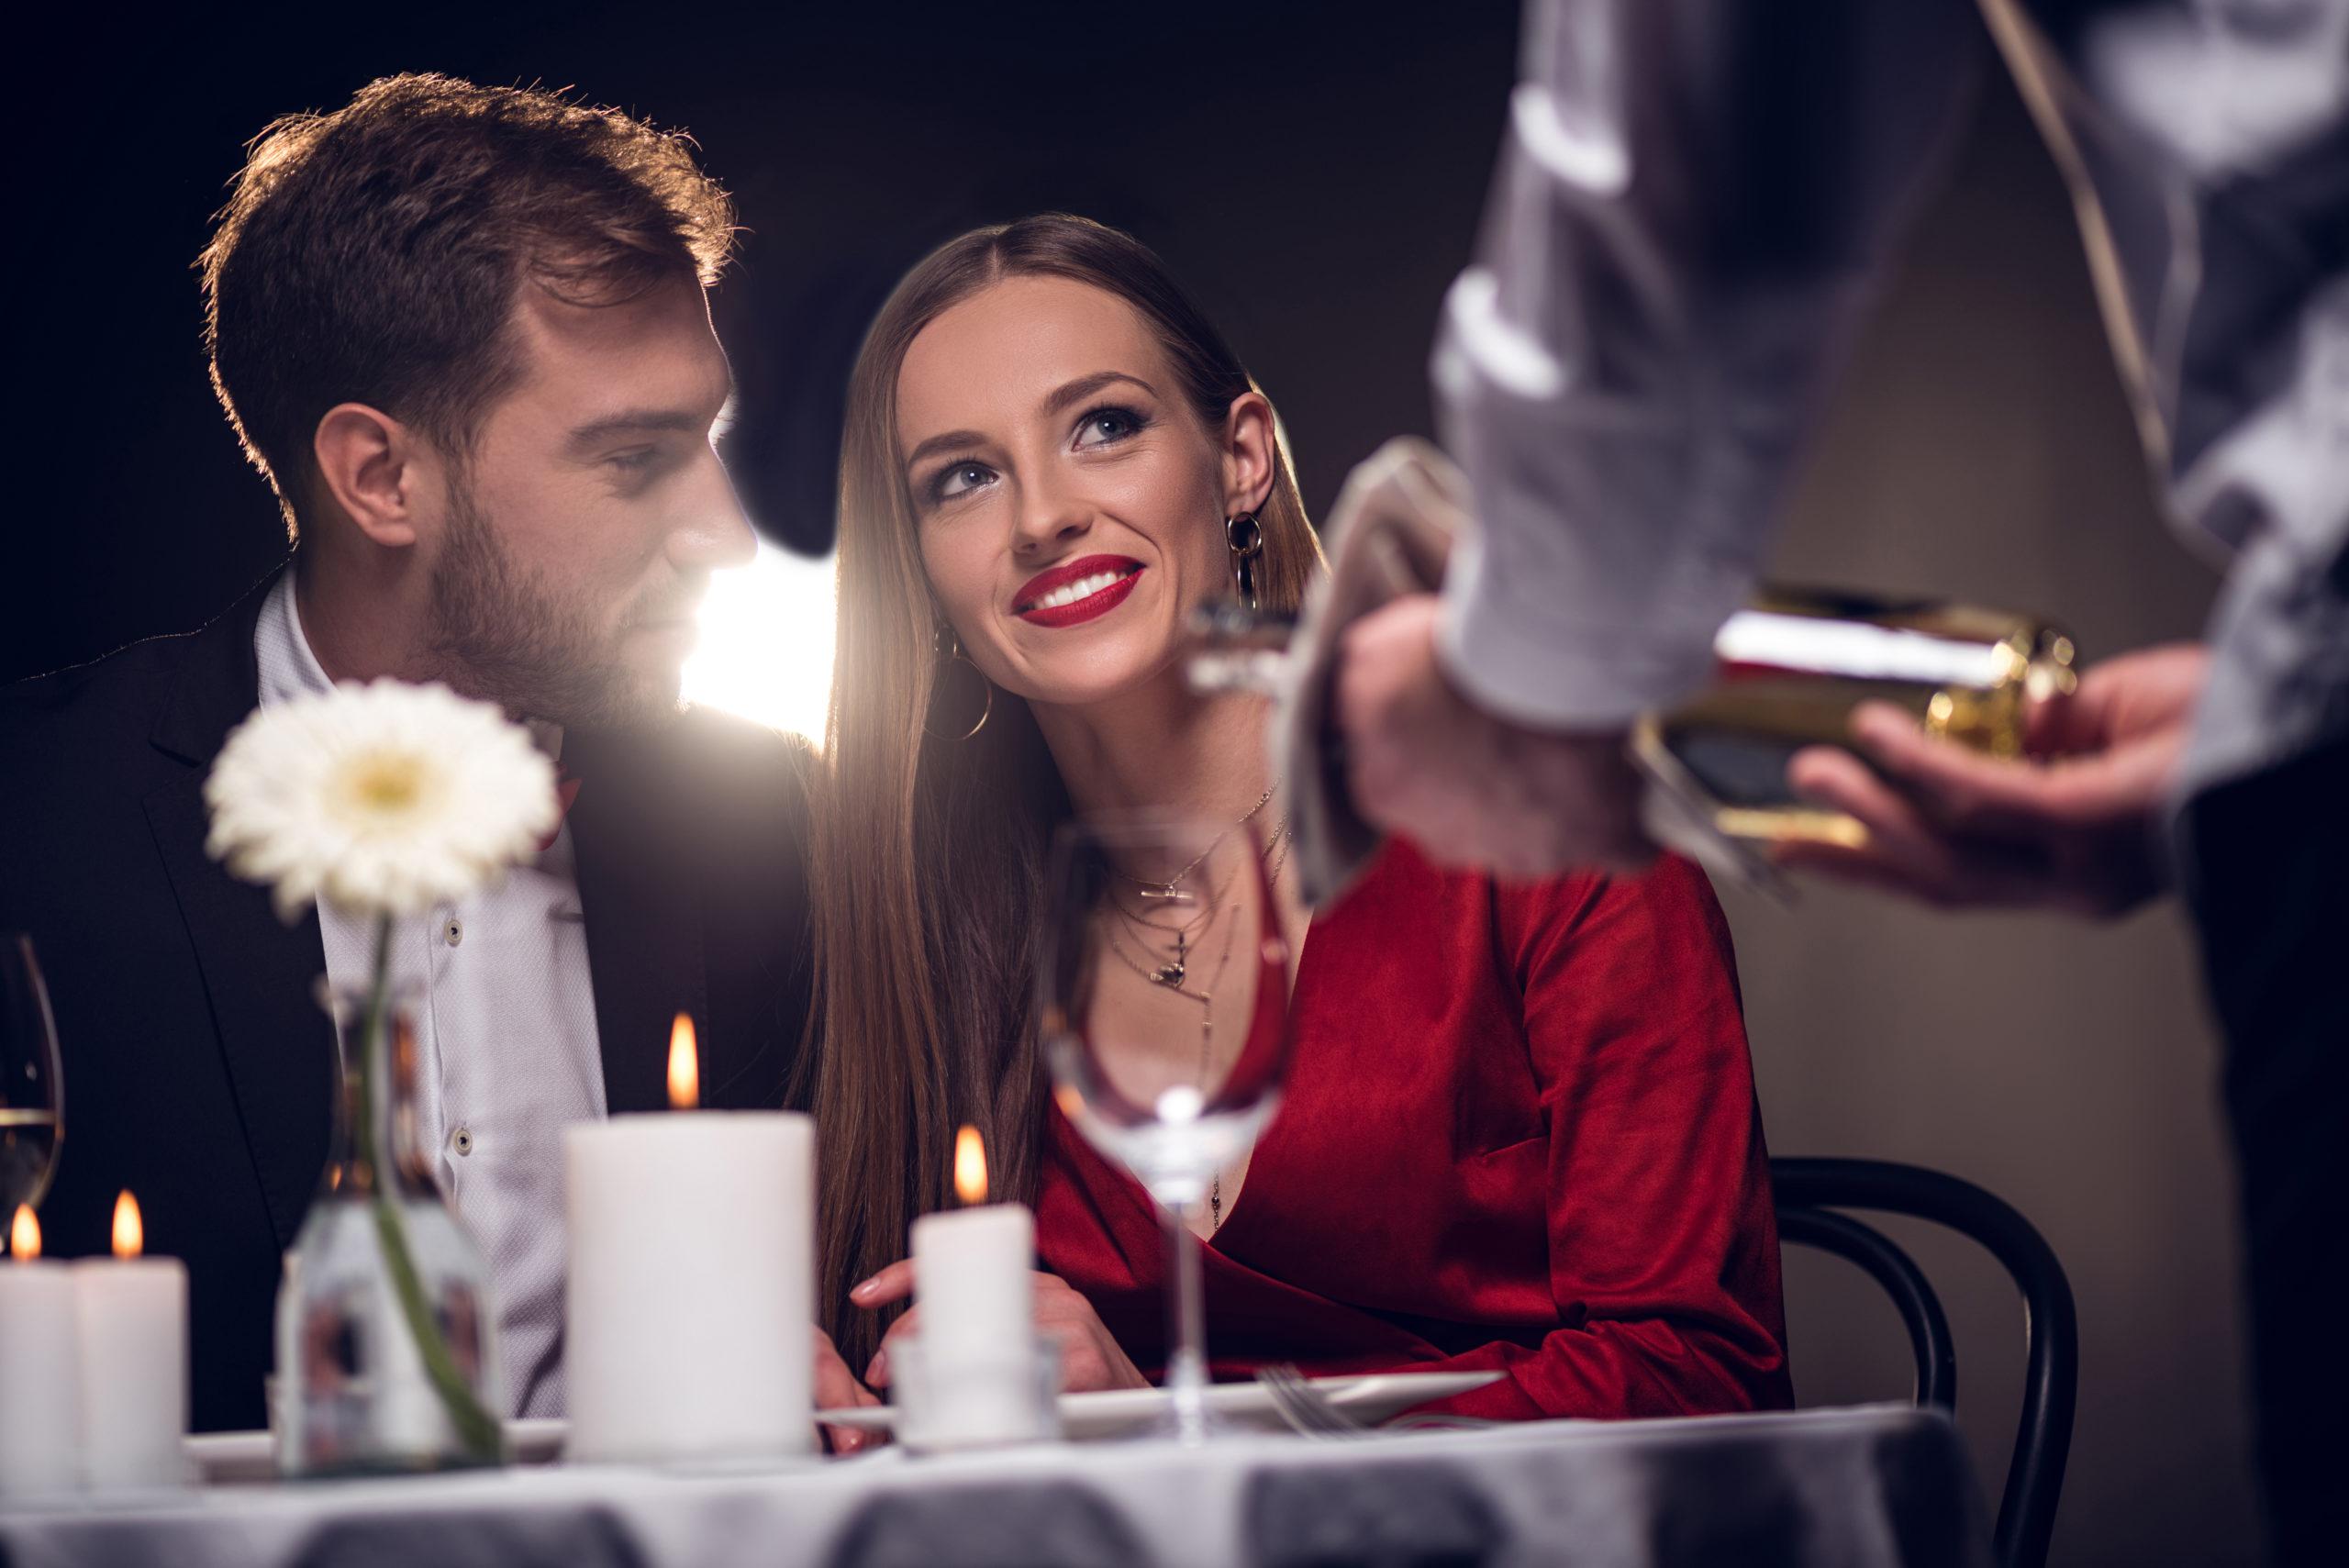 Vino y San Valentín